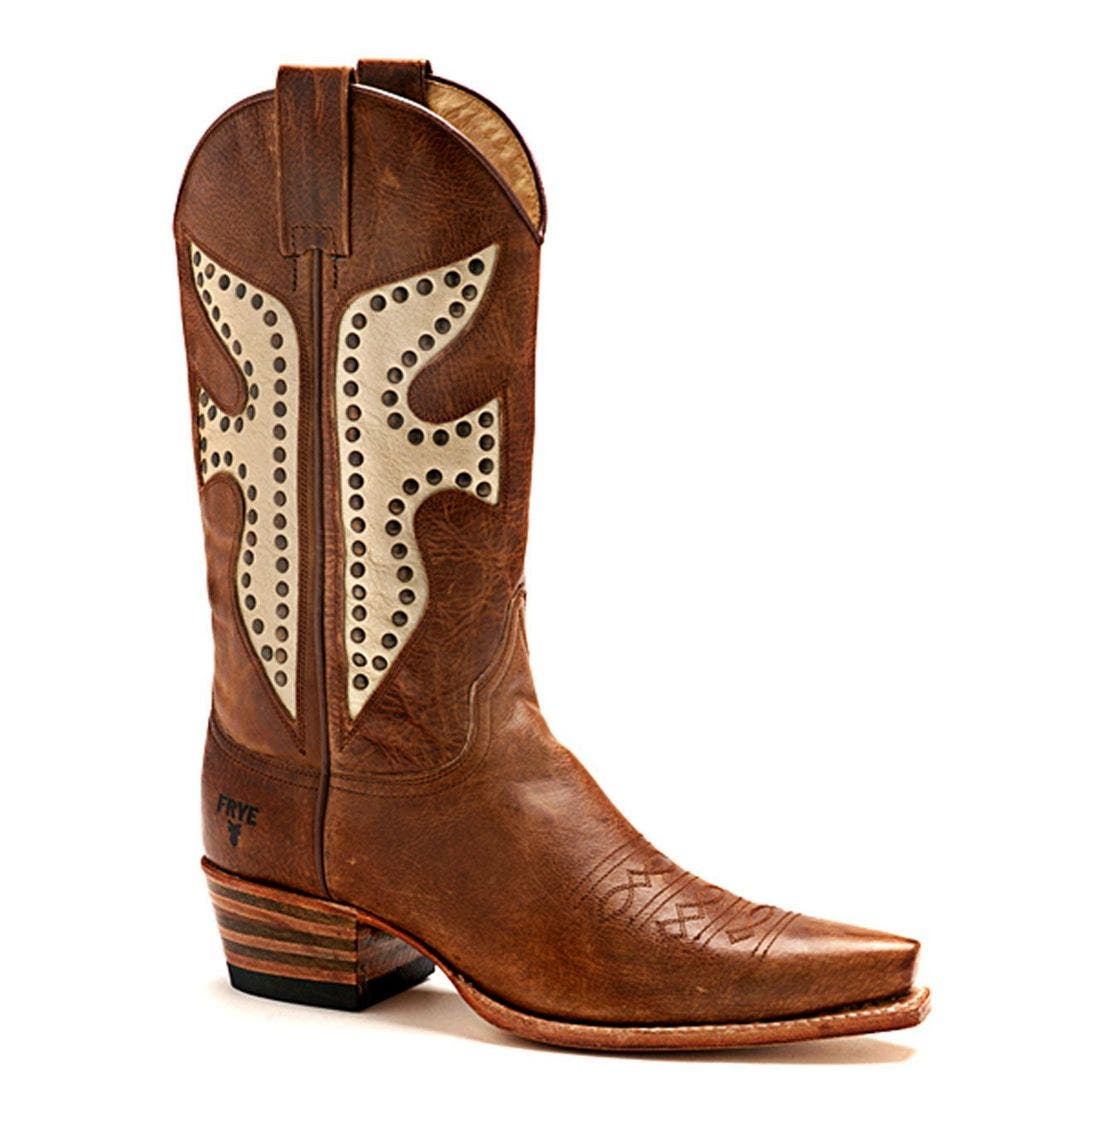 Main Image - Frye 'Daisy Duke' Studded Boot